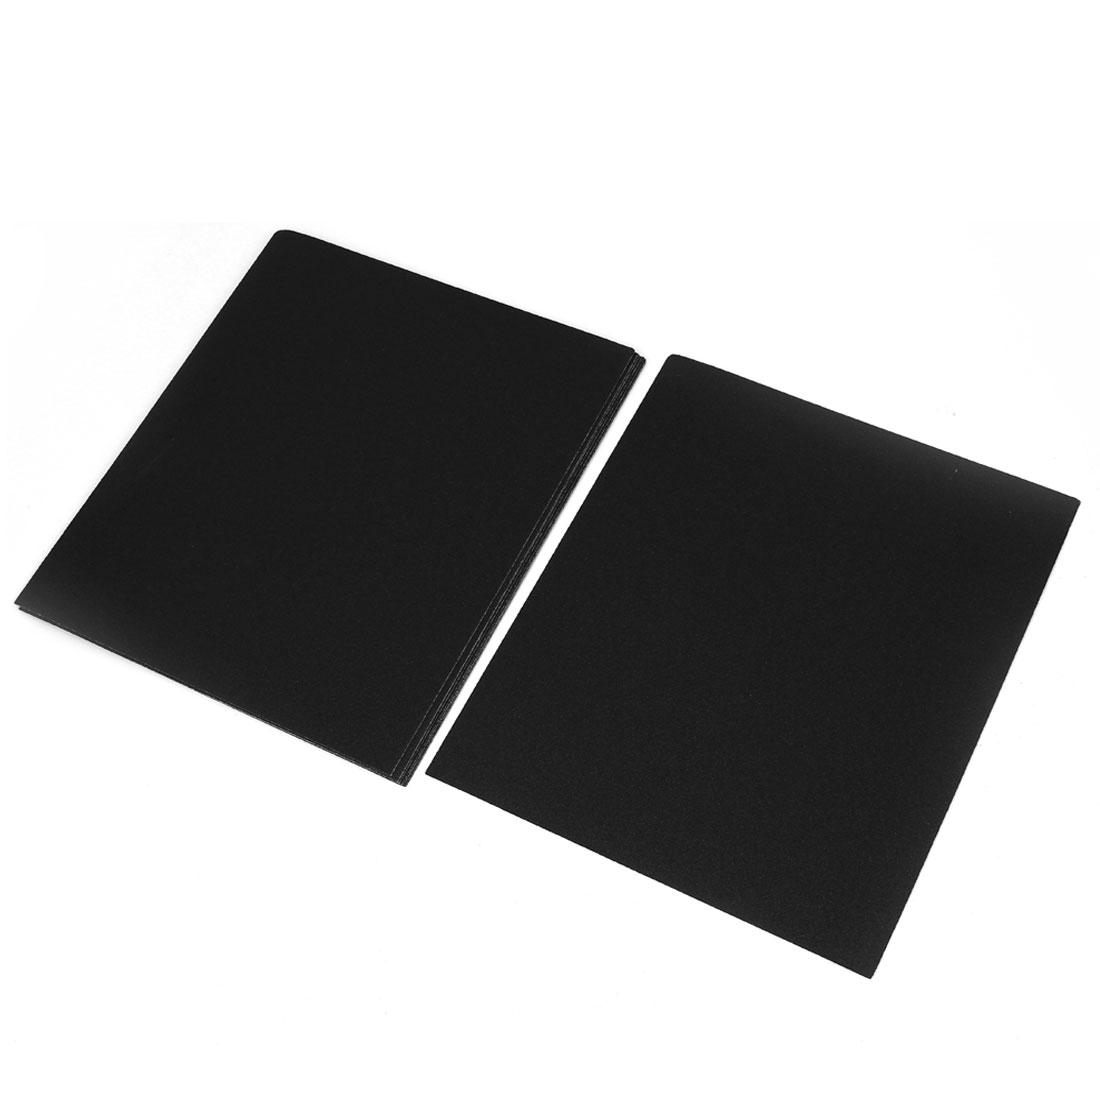 10 Pcs Wet Dry Silicone Carbide Abrasive Sandpaper Sheets 1000 Grit